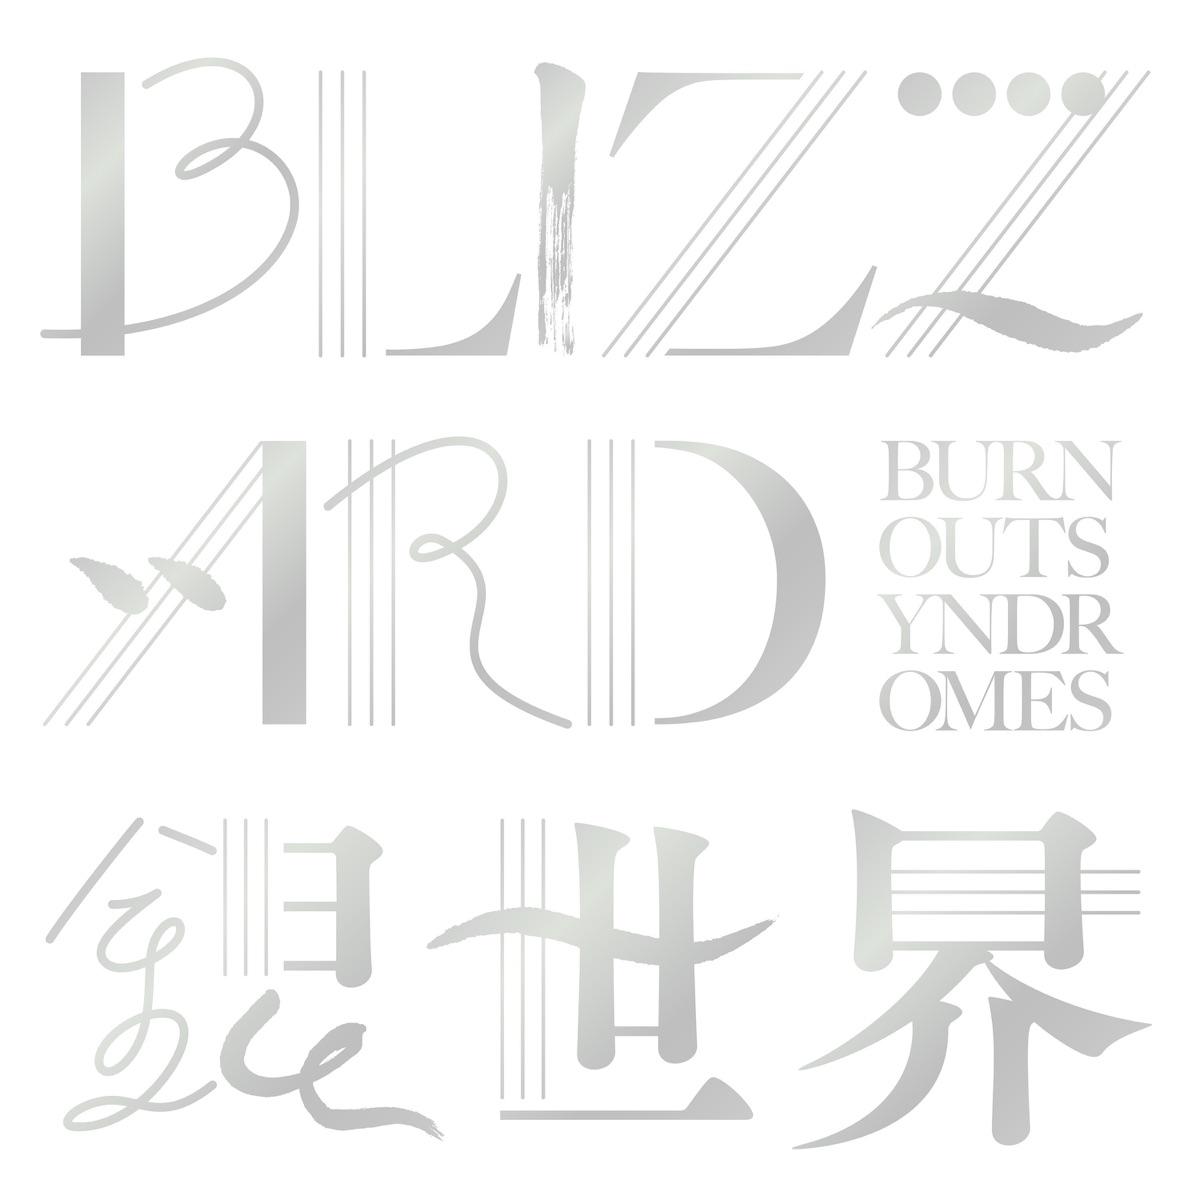 『BURNOUT SYNDROMES - BLIZZARD』収録の『BLIZZARD』ジャケット